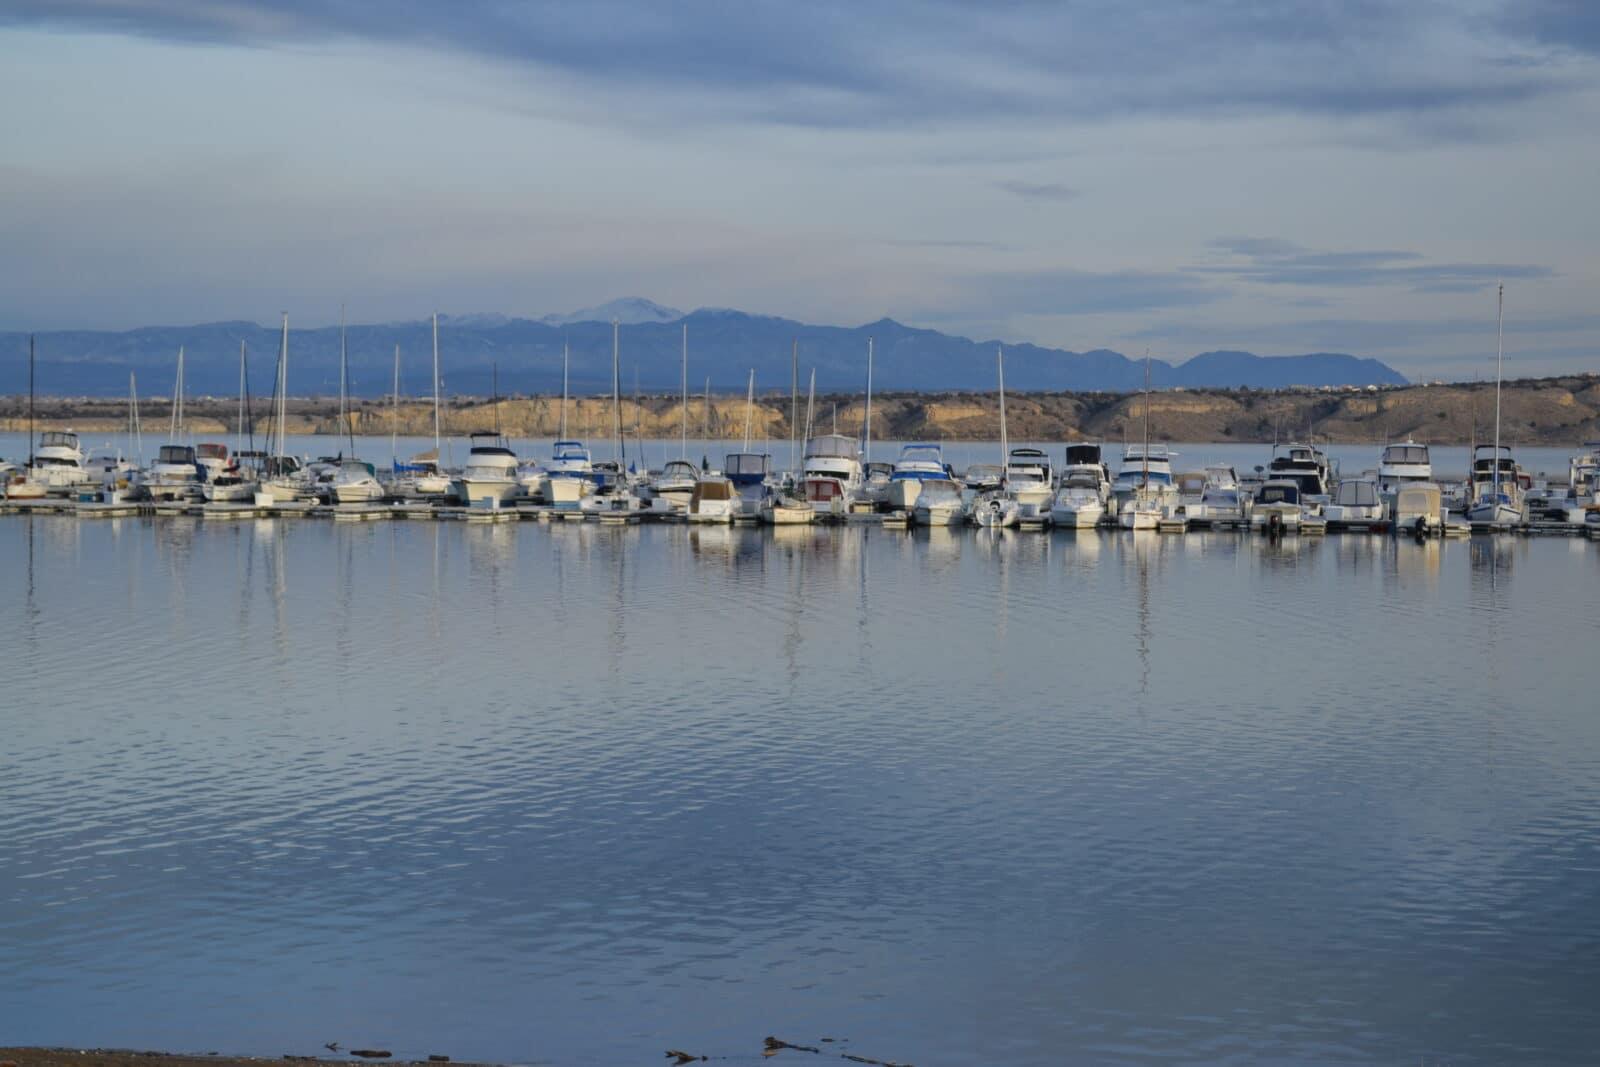 Boats at the Pueblo Reservoir, CO